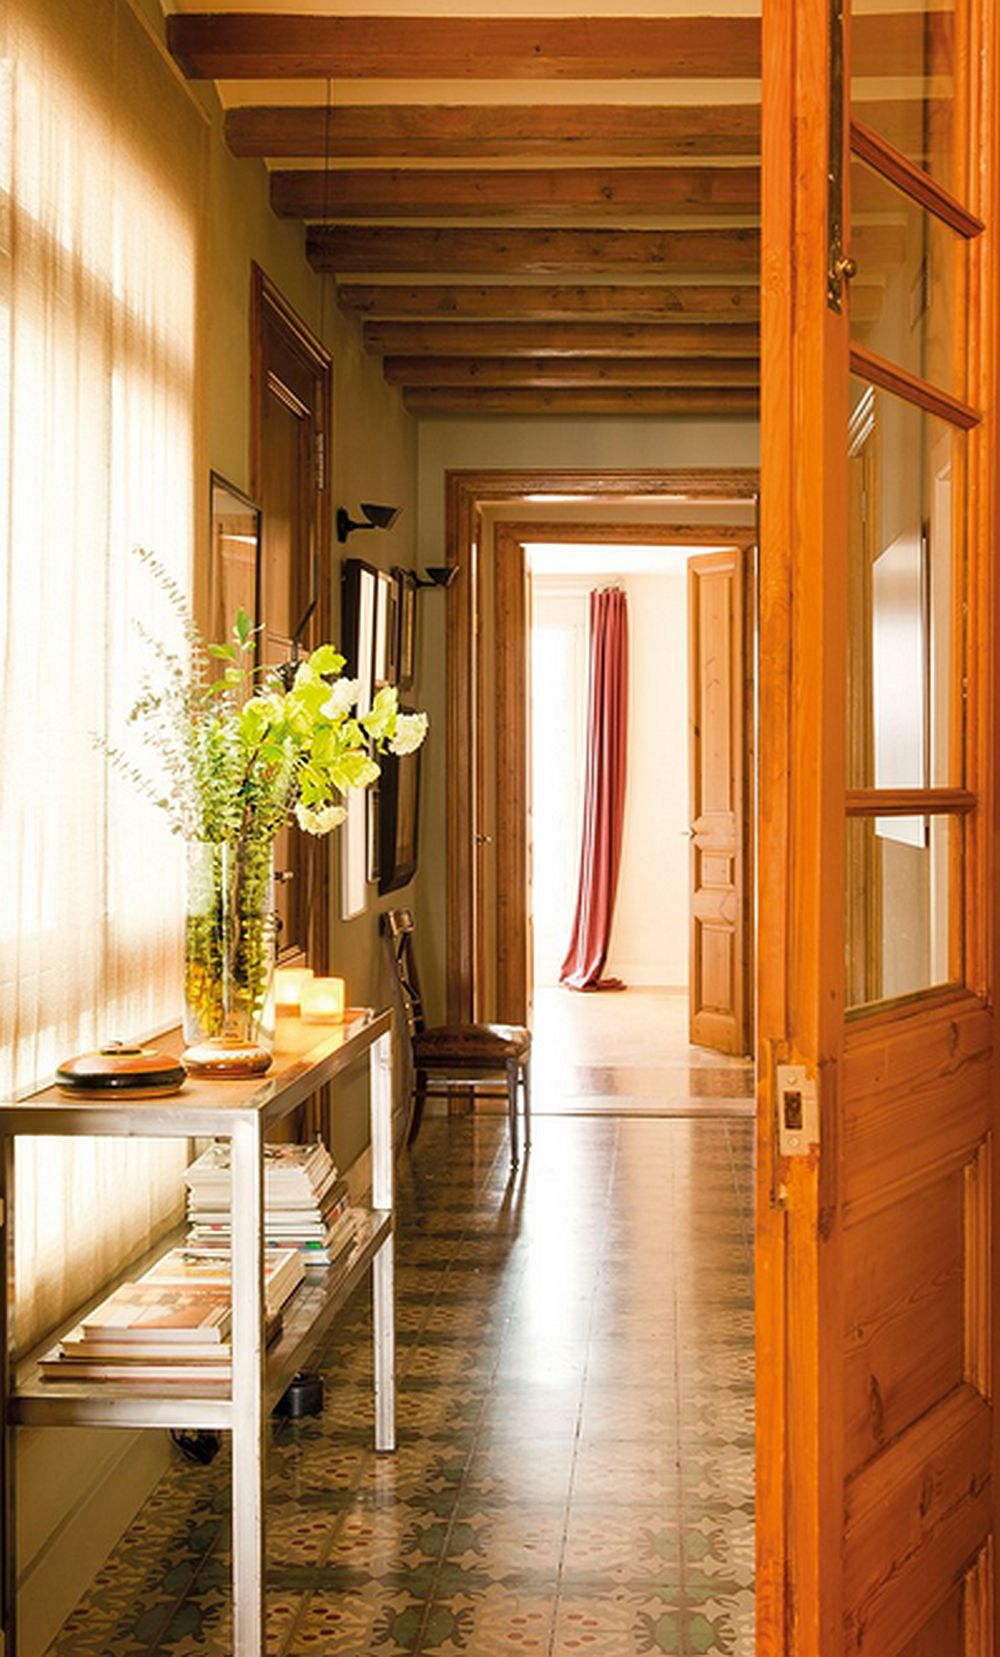 adelaparvu.com despre rustic si modern intr-o casa de la oras Foto ElMueble (1)